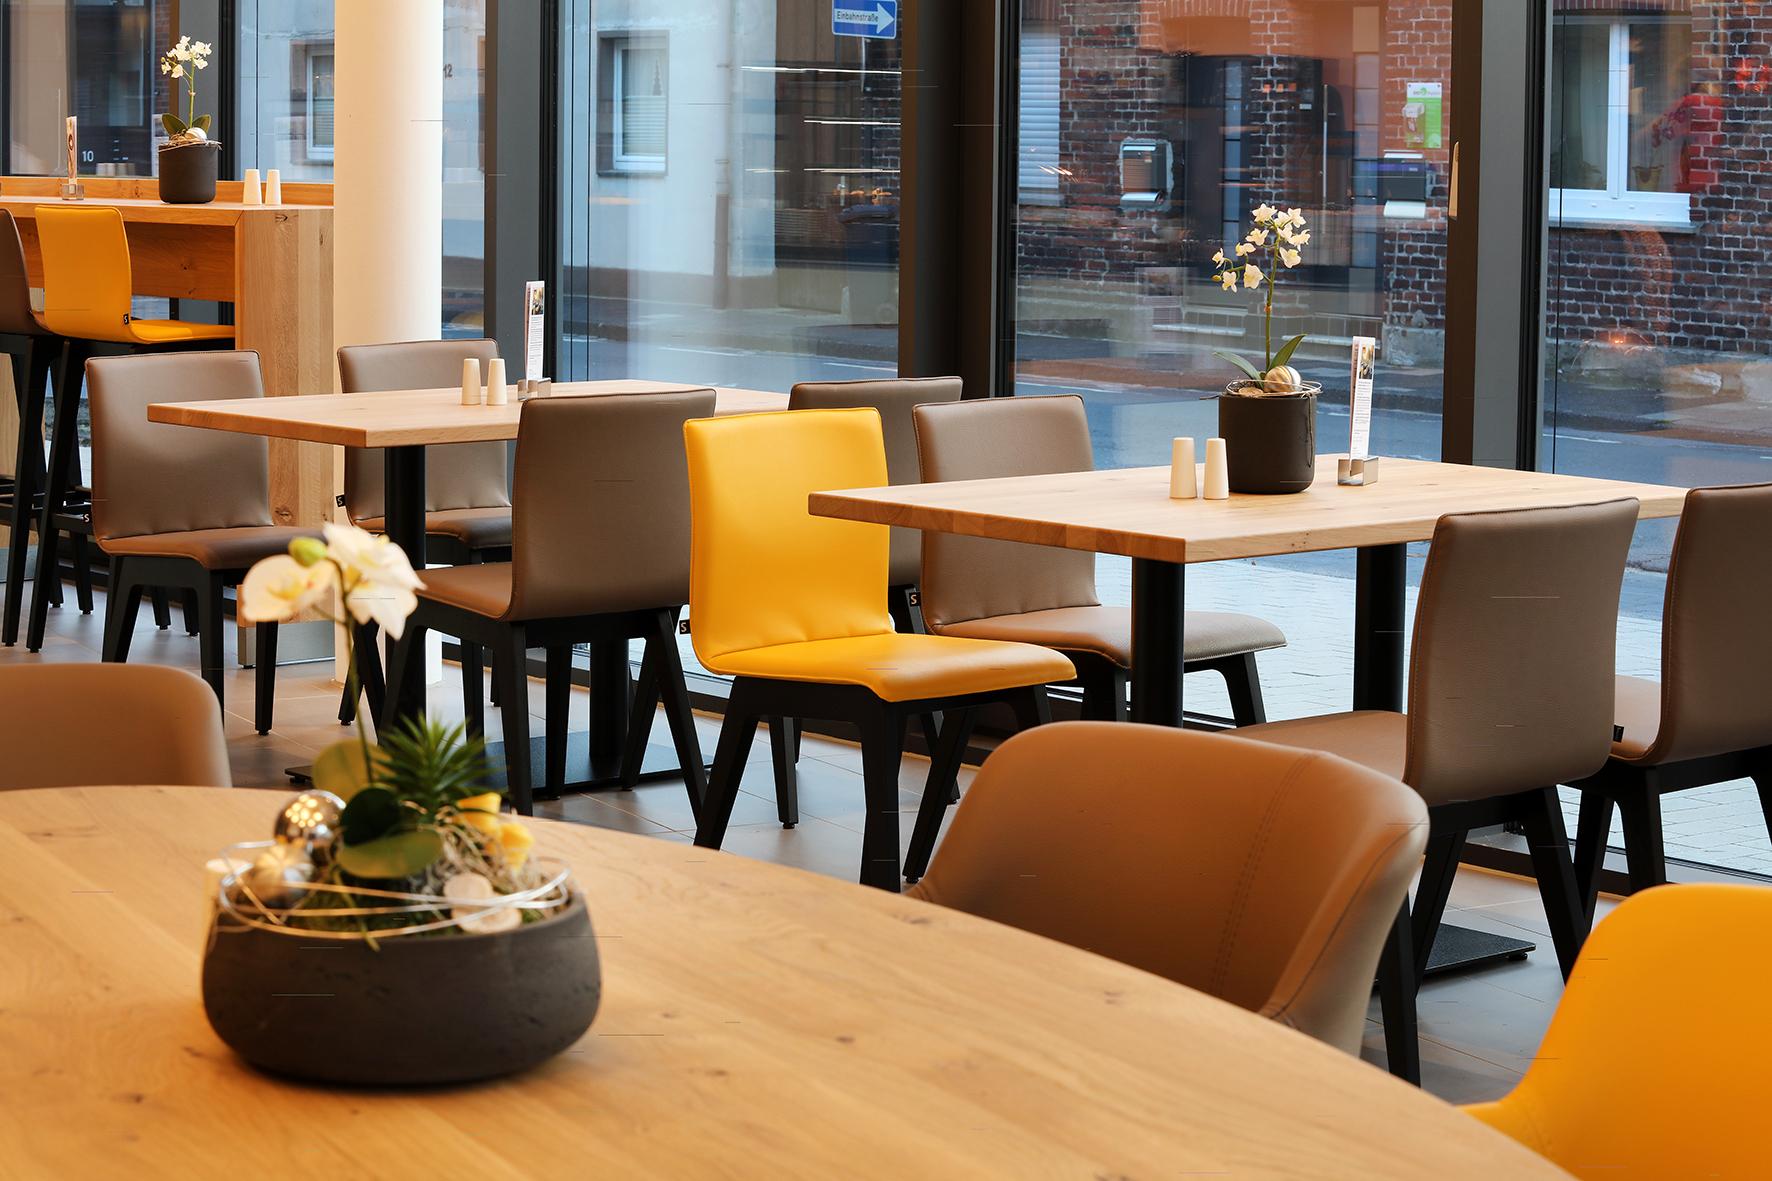 Krankenhaus-Café Restaurant Kantine